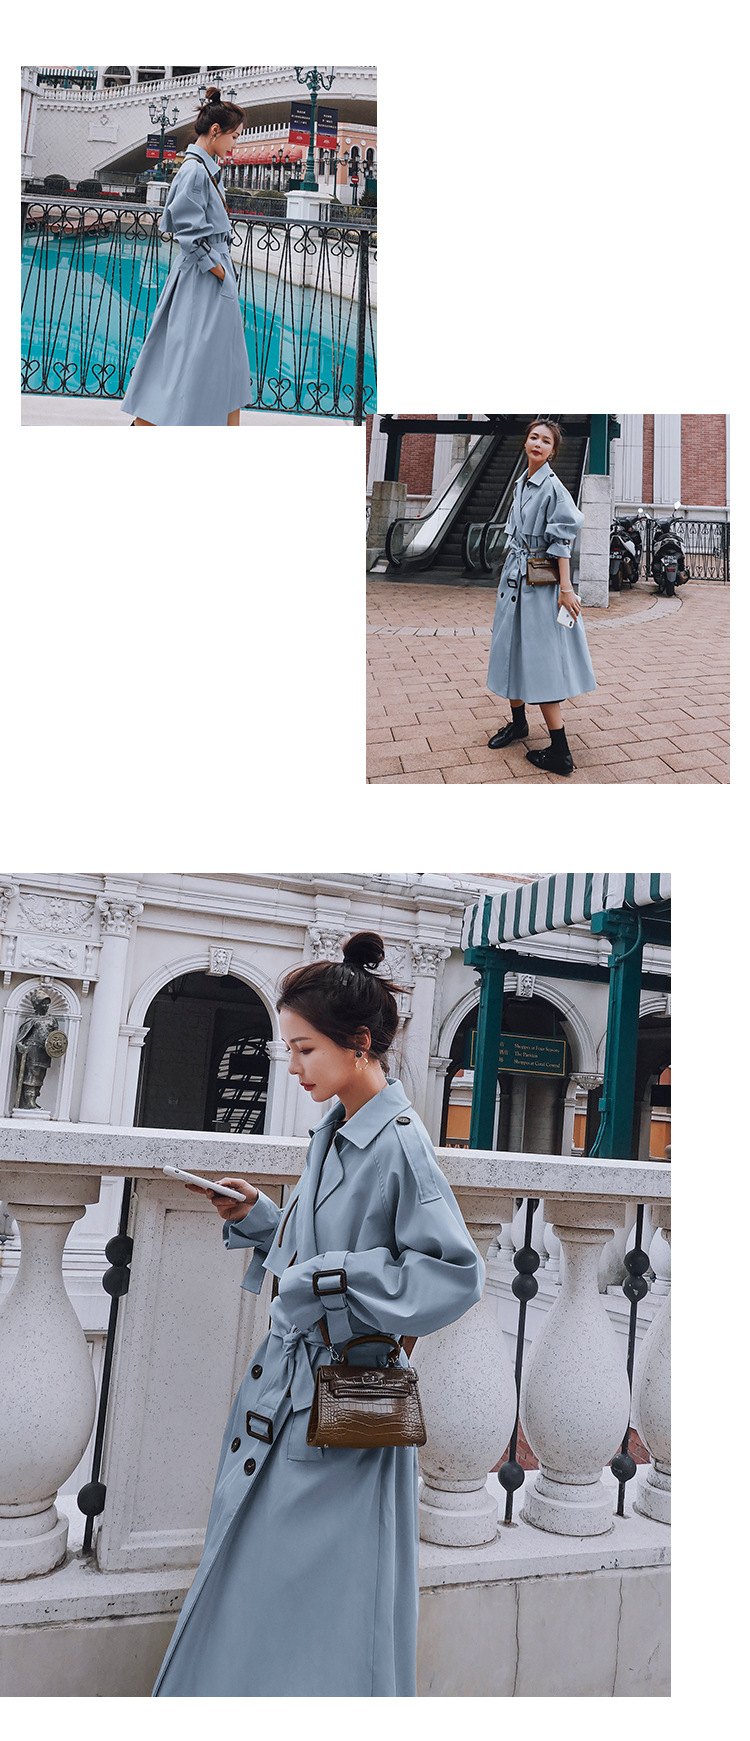 H2656c8b4d28e484785369cdcf5efe5137 2021 Autumn Women Trench Coat With Belt Women Clothes Blue Coat Casaco Feminino Harajuku Abrigo Mujer Long Trench Femme